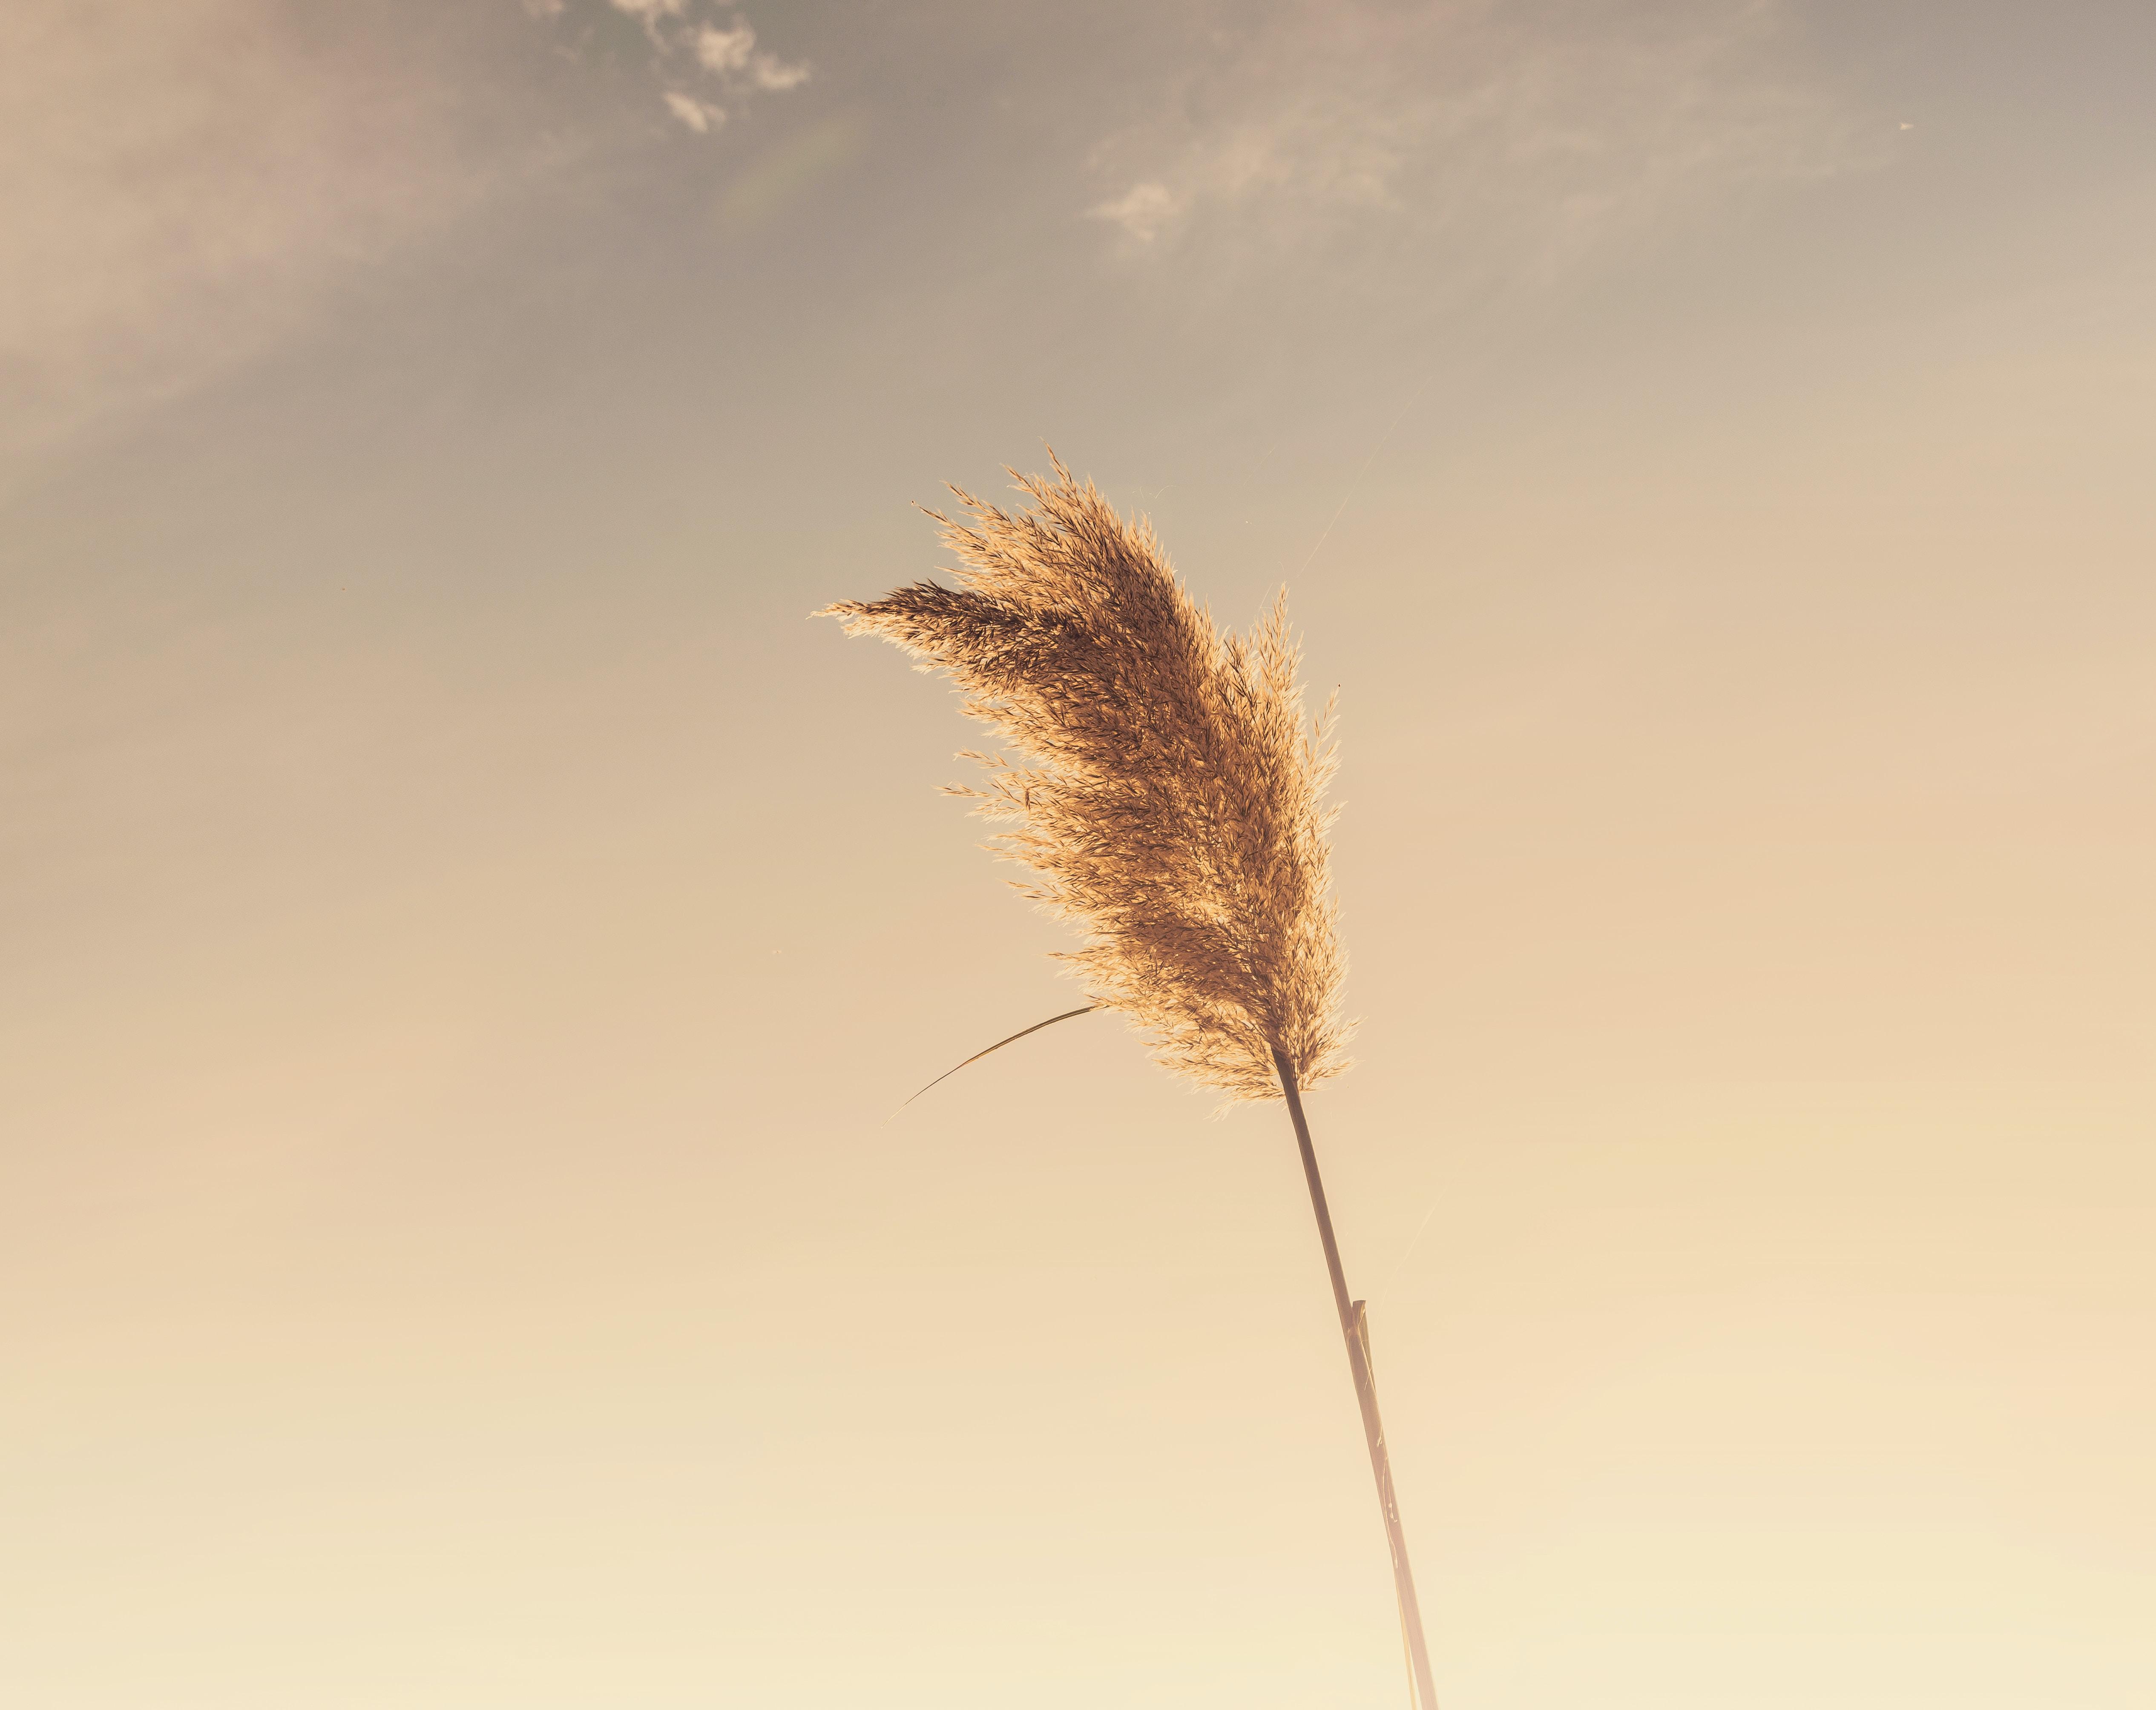 worm's eye view of brown wheat under orange sky